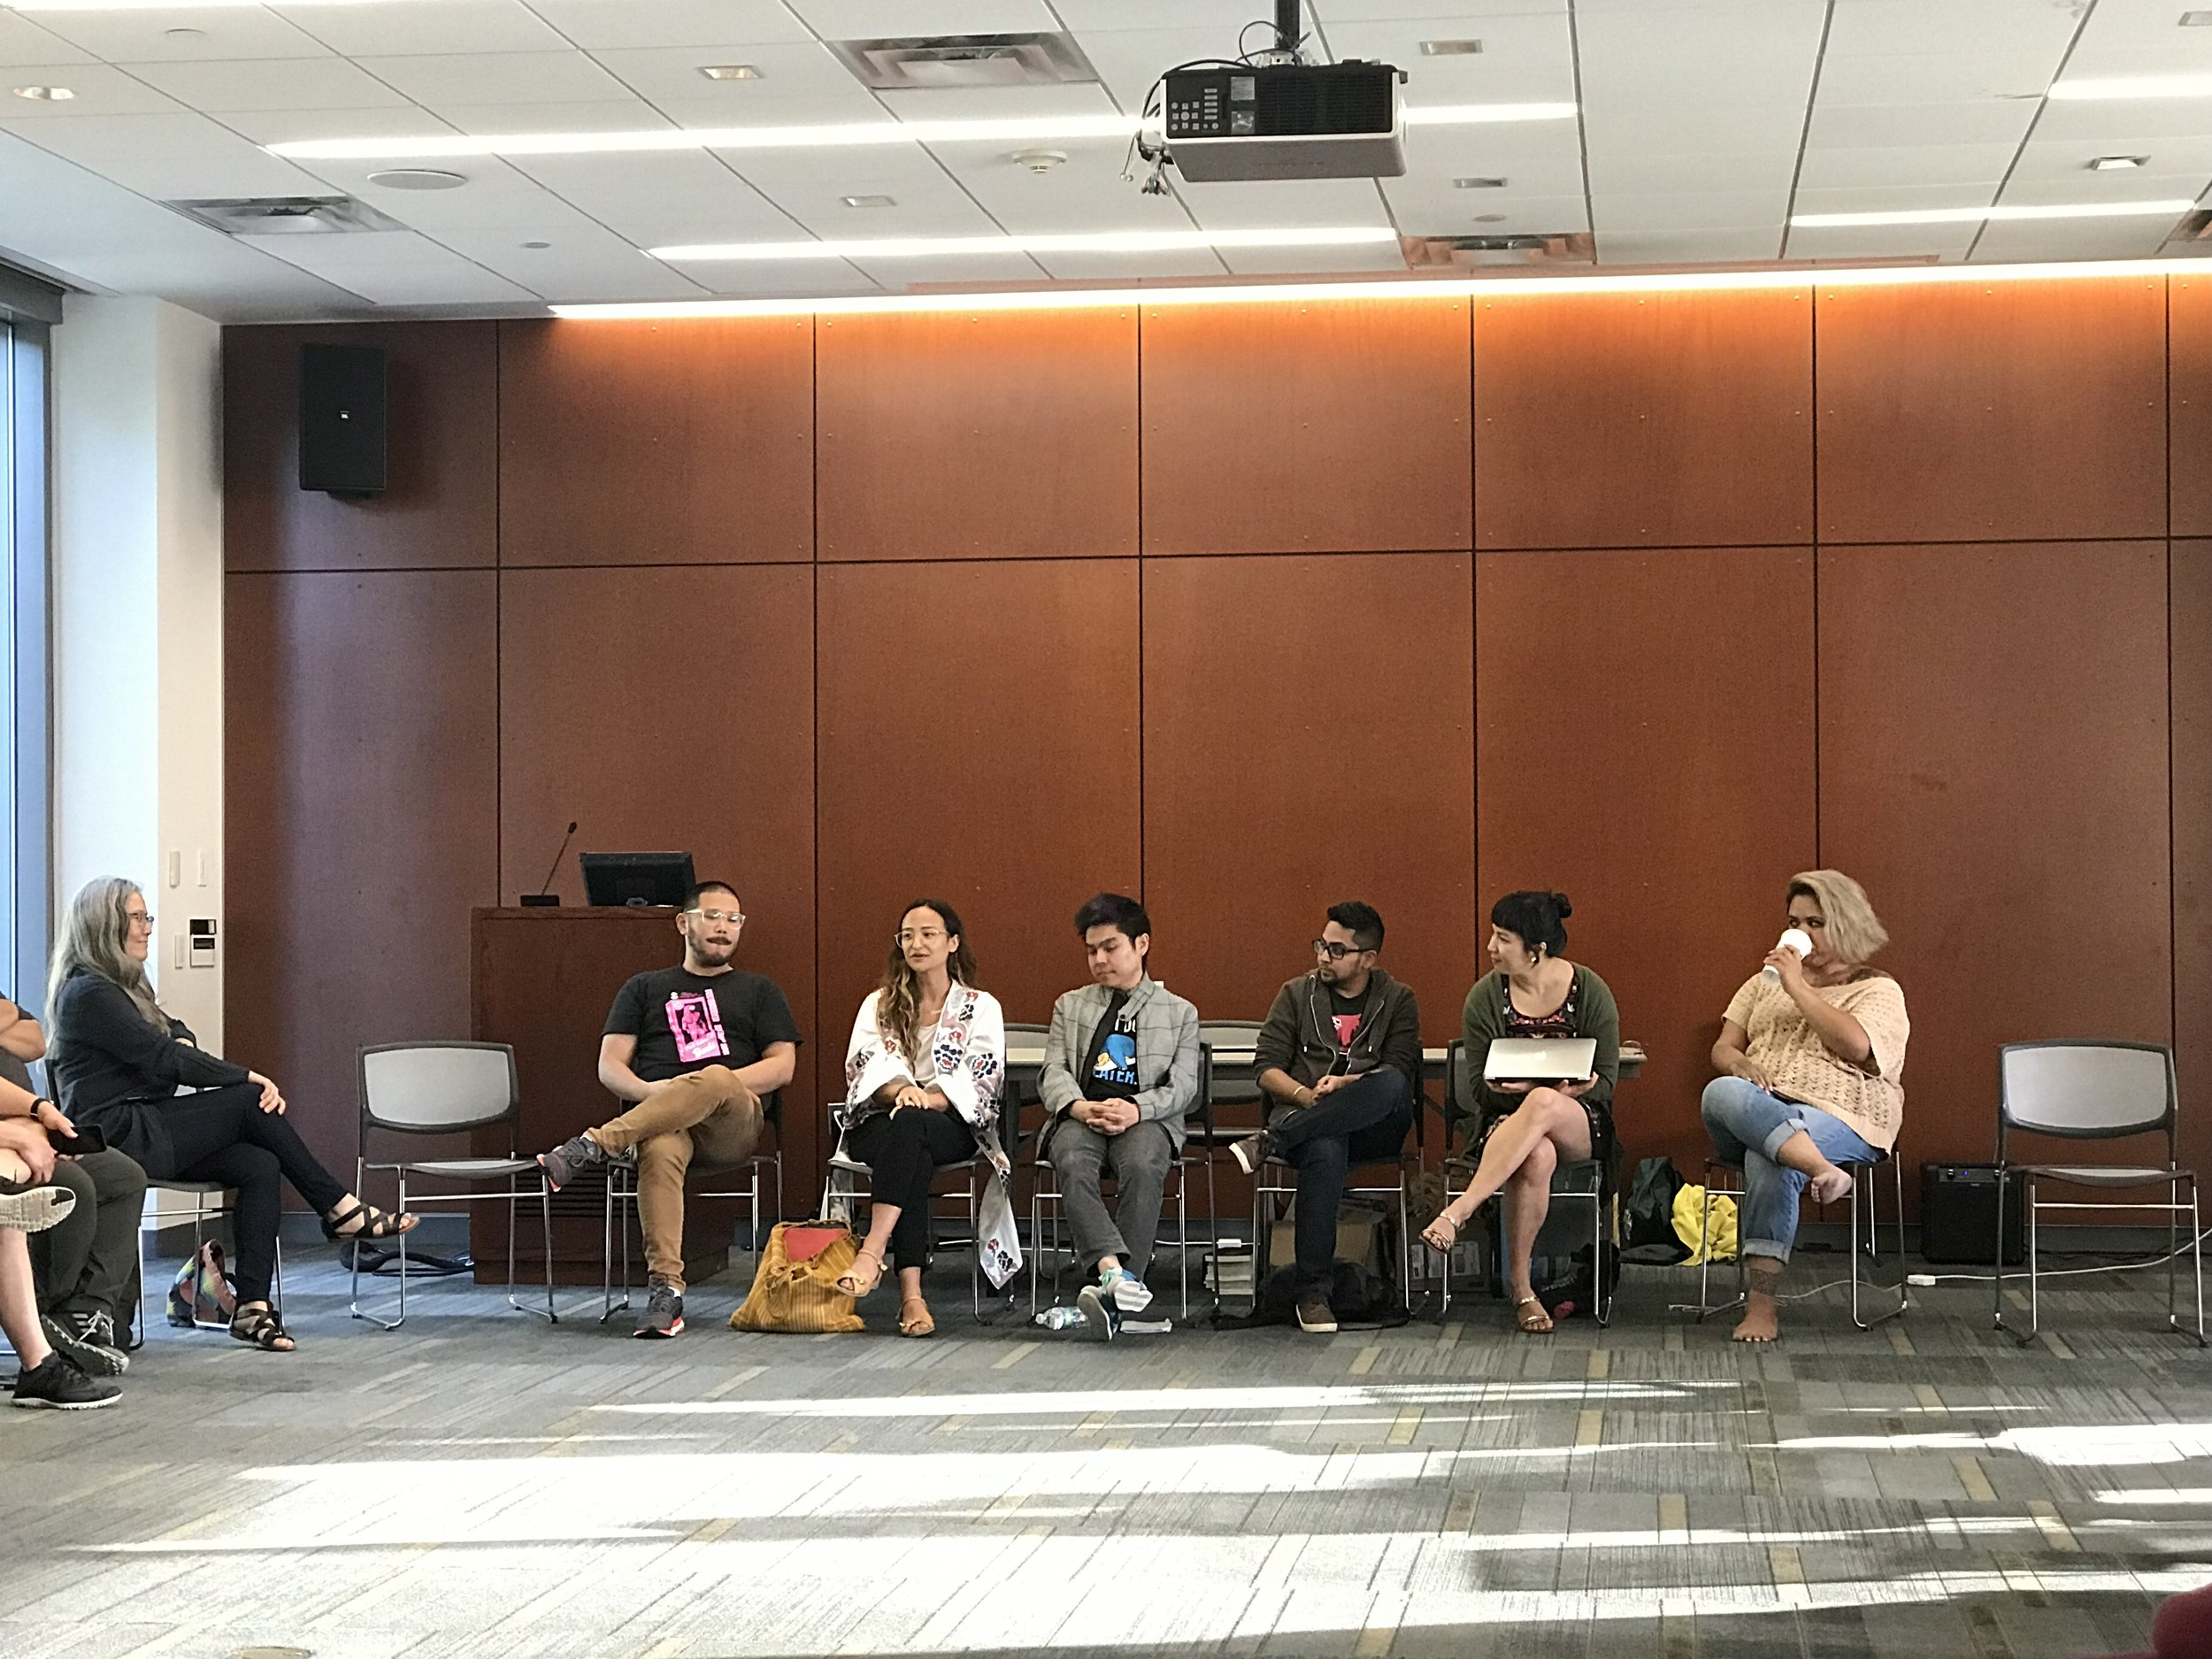 Dan Lau, Kyle Lucia Wu, Duy Doan, Jai Dulani, Cathy Linh Che, and Terisa Siagatonu presenting the Writing, Professionalization, and Community Seminar!